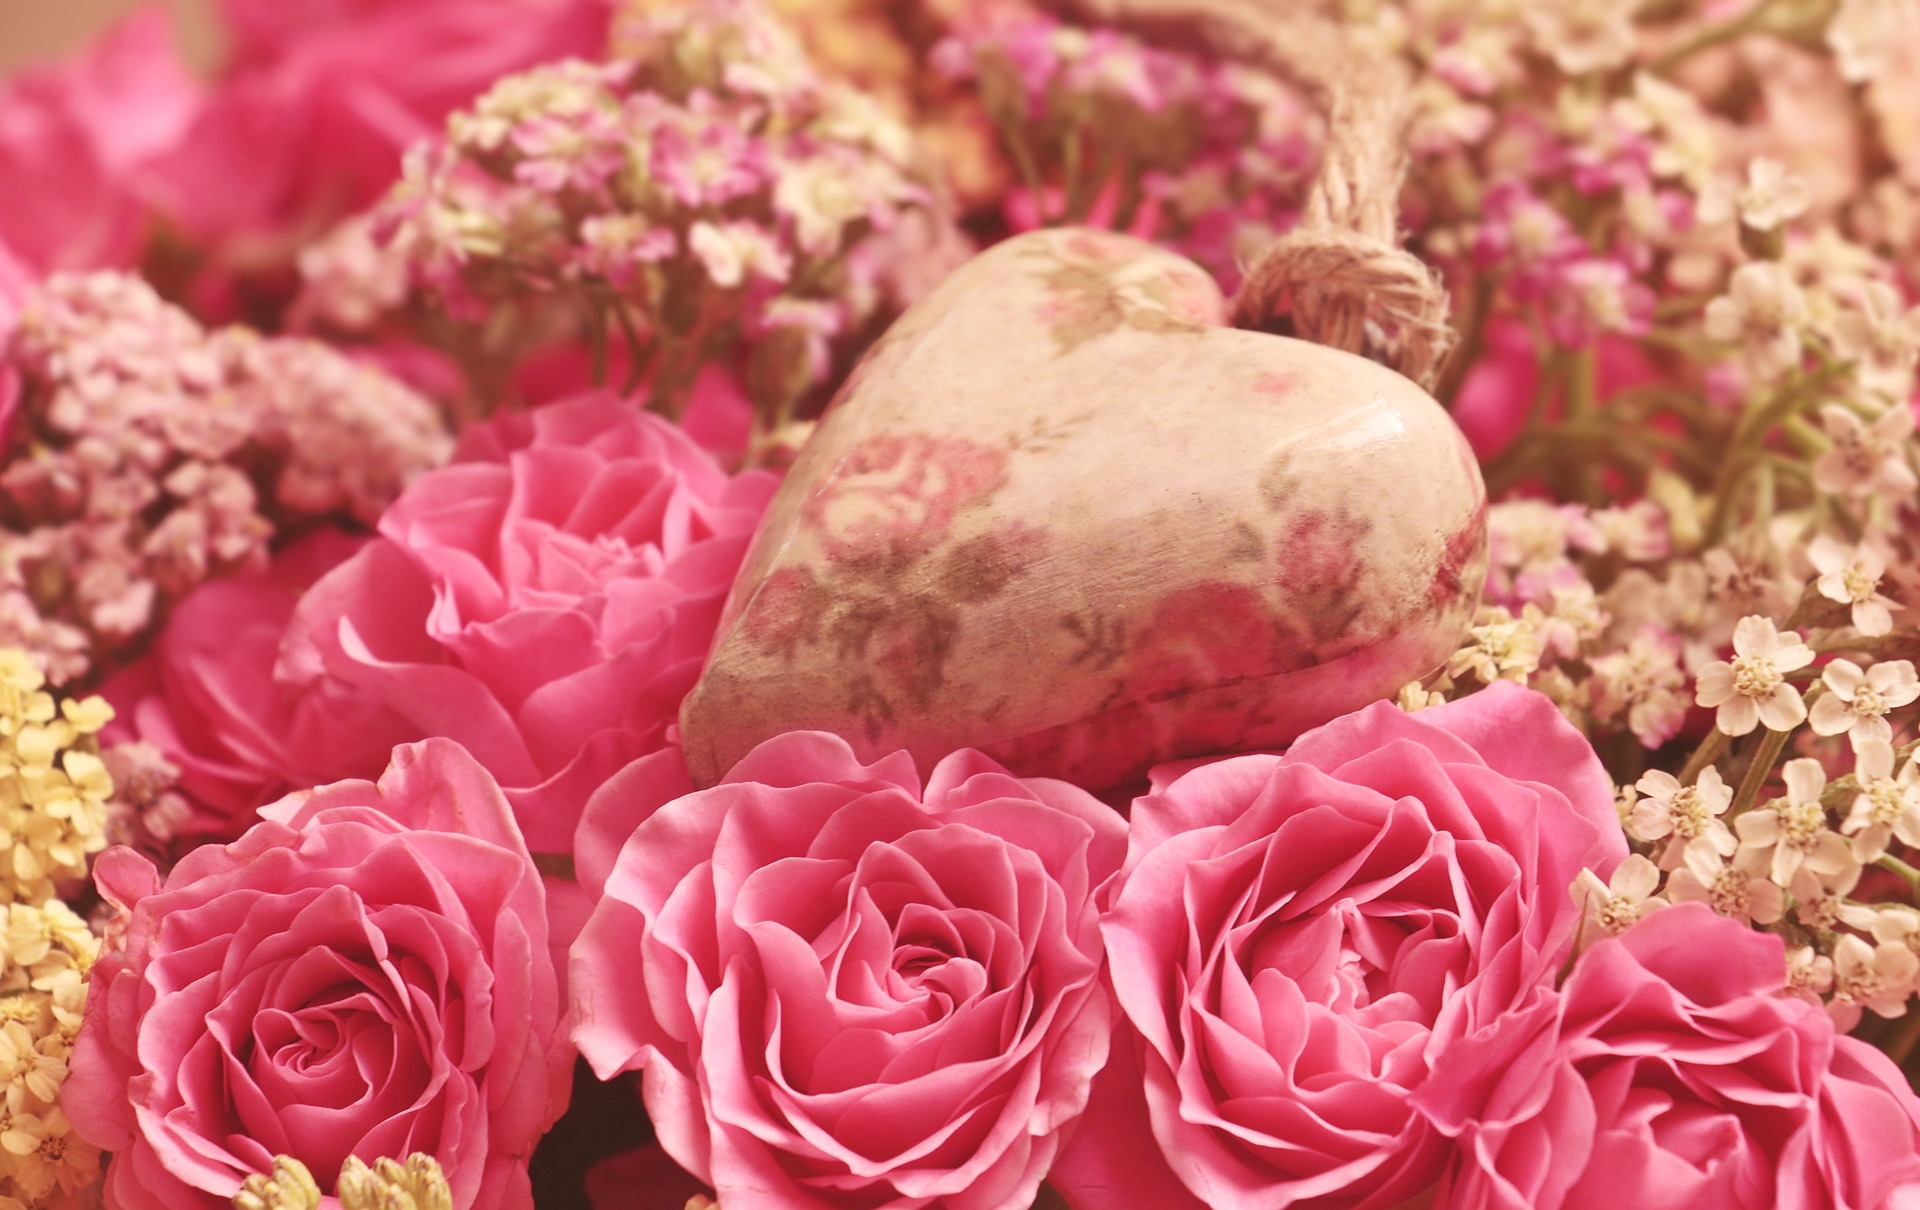 https://cdn.pixabay.com/photo/2018/09/24/13/54/roses-3699995_960_720.jpg